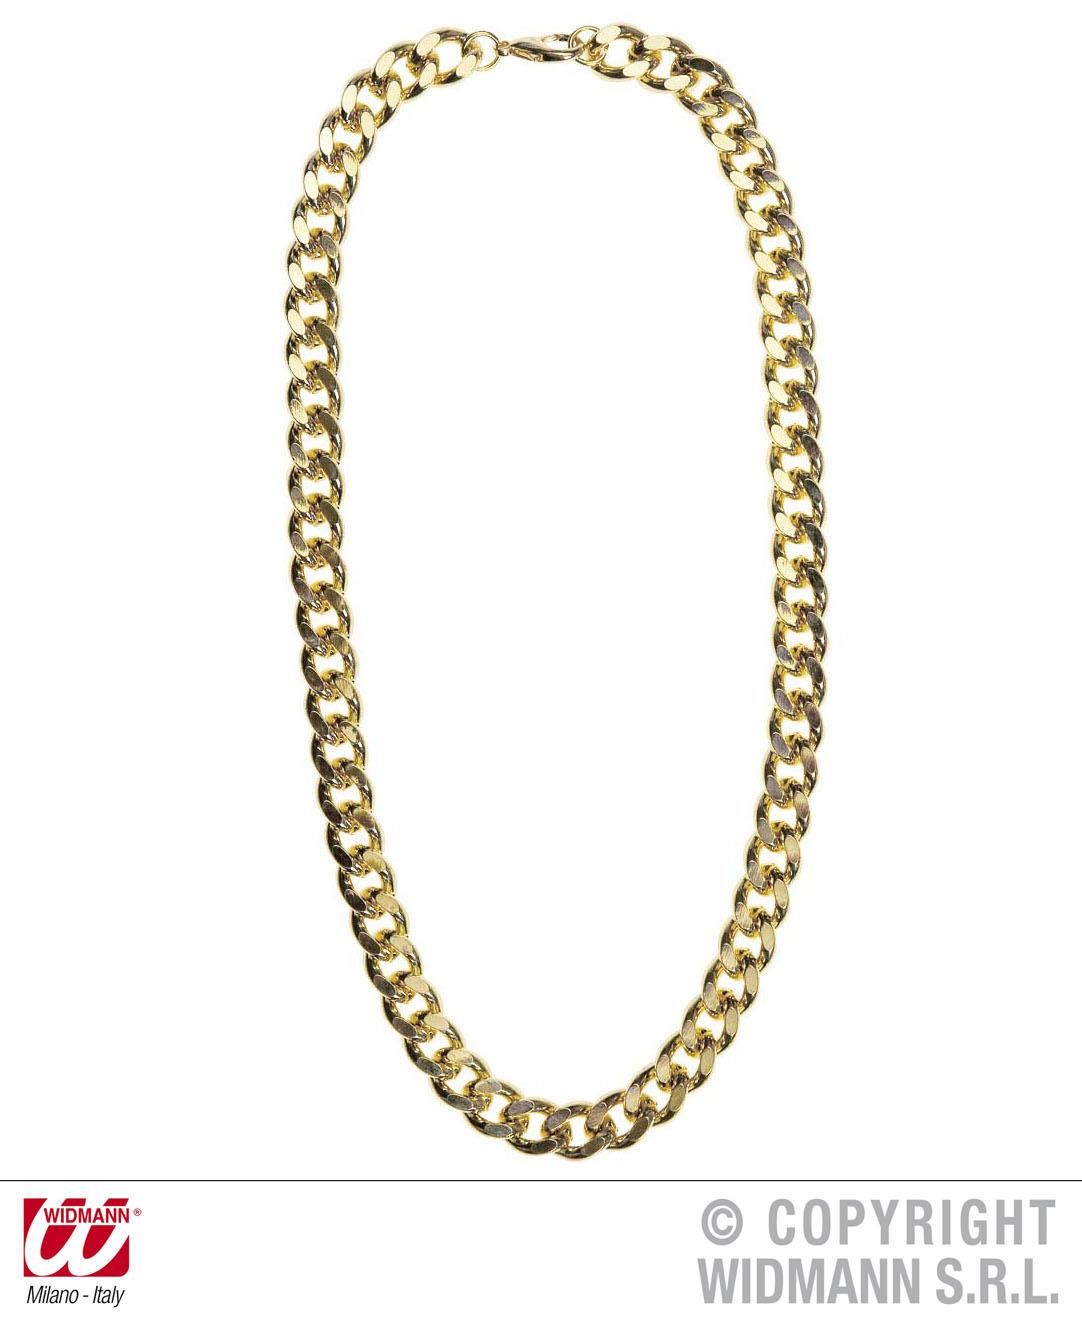 Goldketten rapper  Goldkette schwer 80er Jahre, ca 60 cm lang,Ganster, Rapper ...